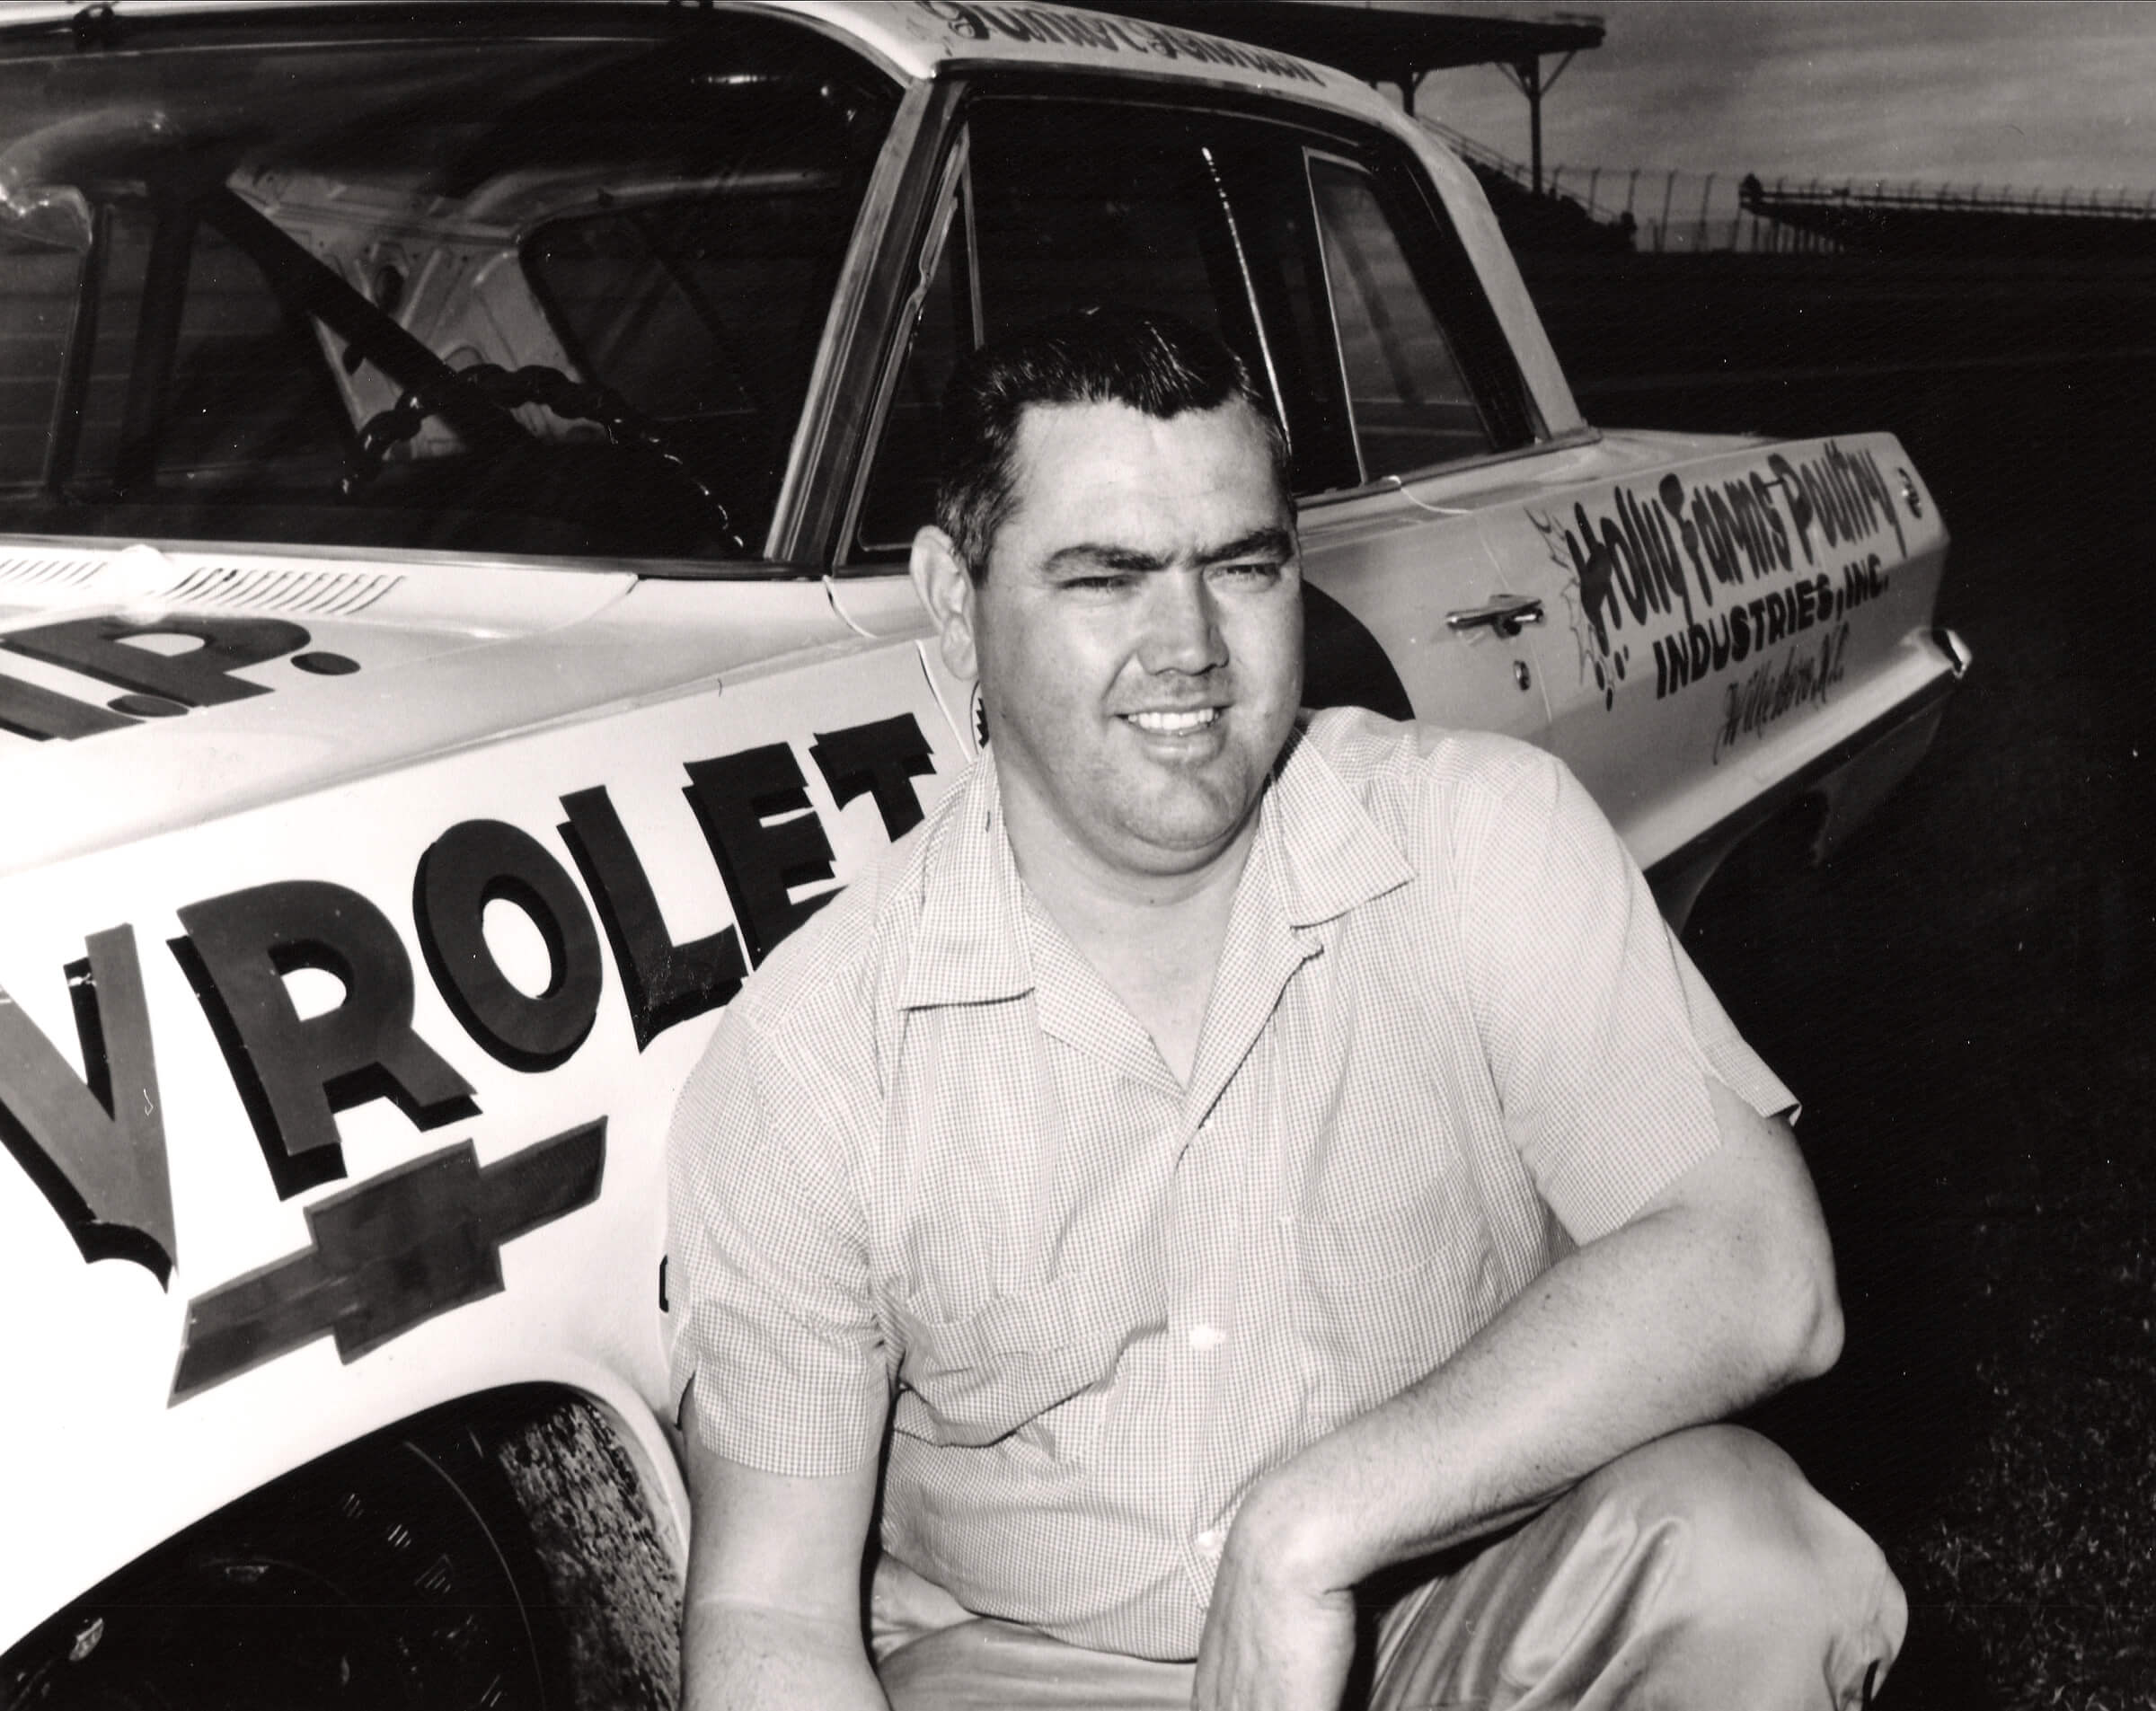 Junior Johnson NASCAR driver